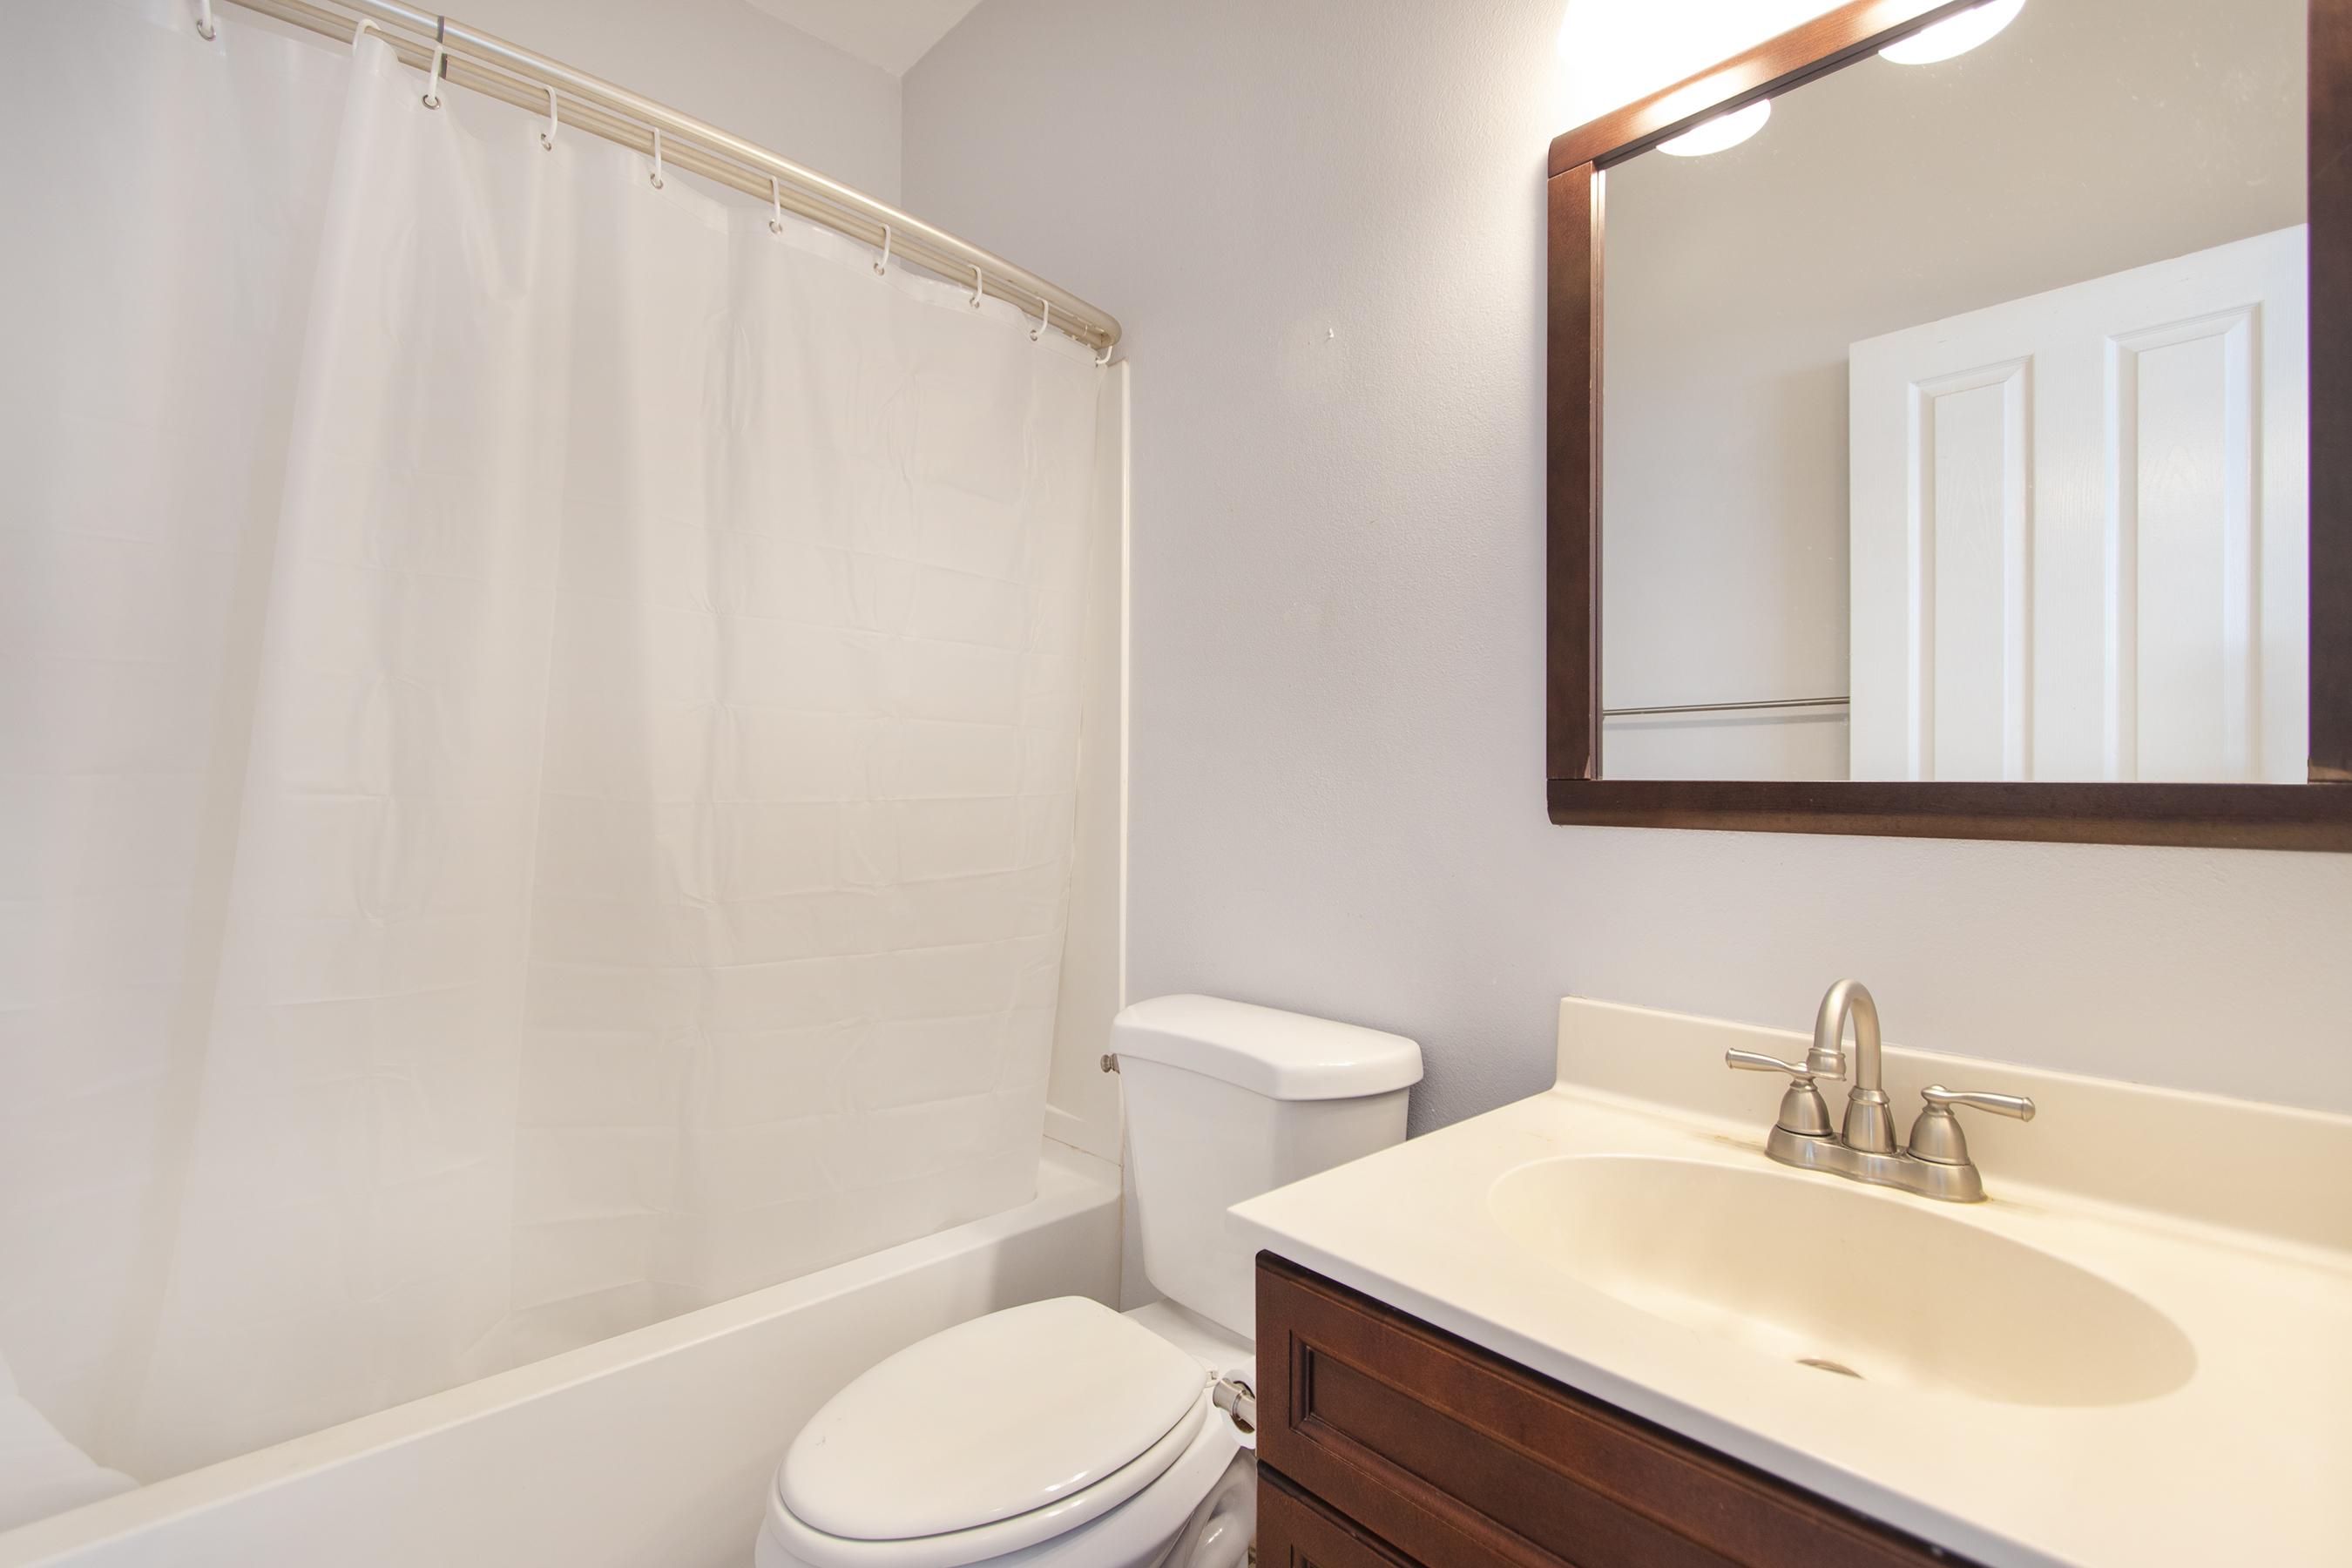 Bathroom 3 at 91-1200 Keaunui Drive #14